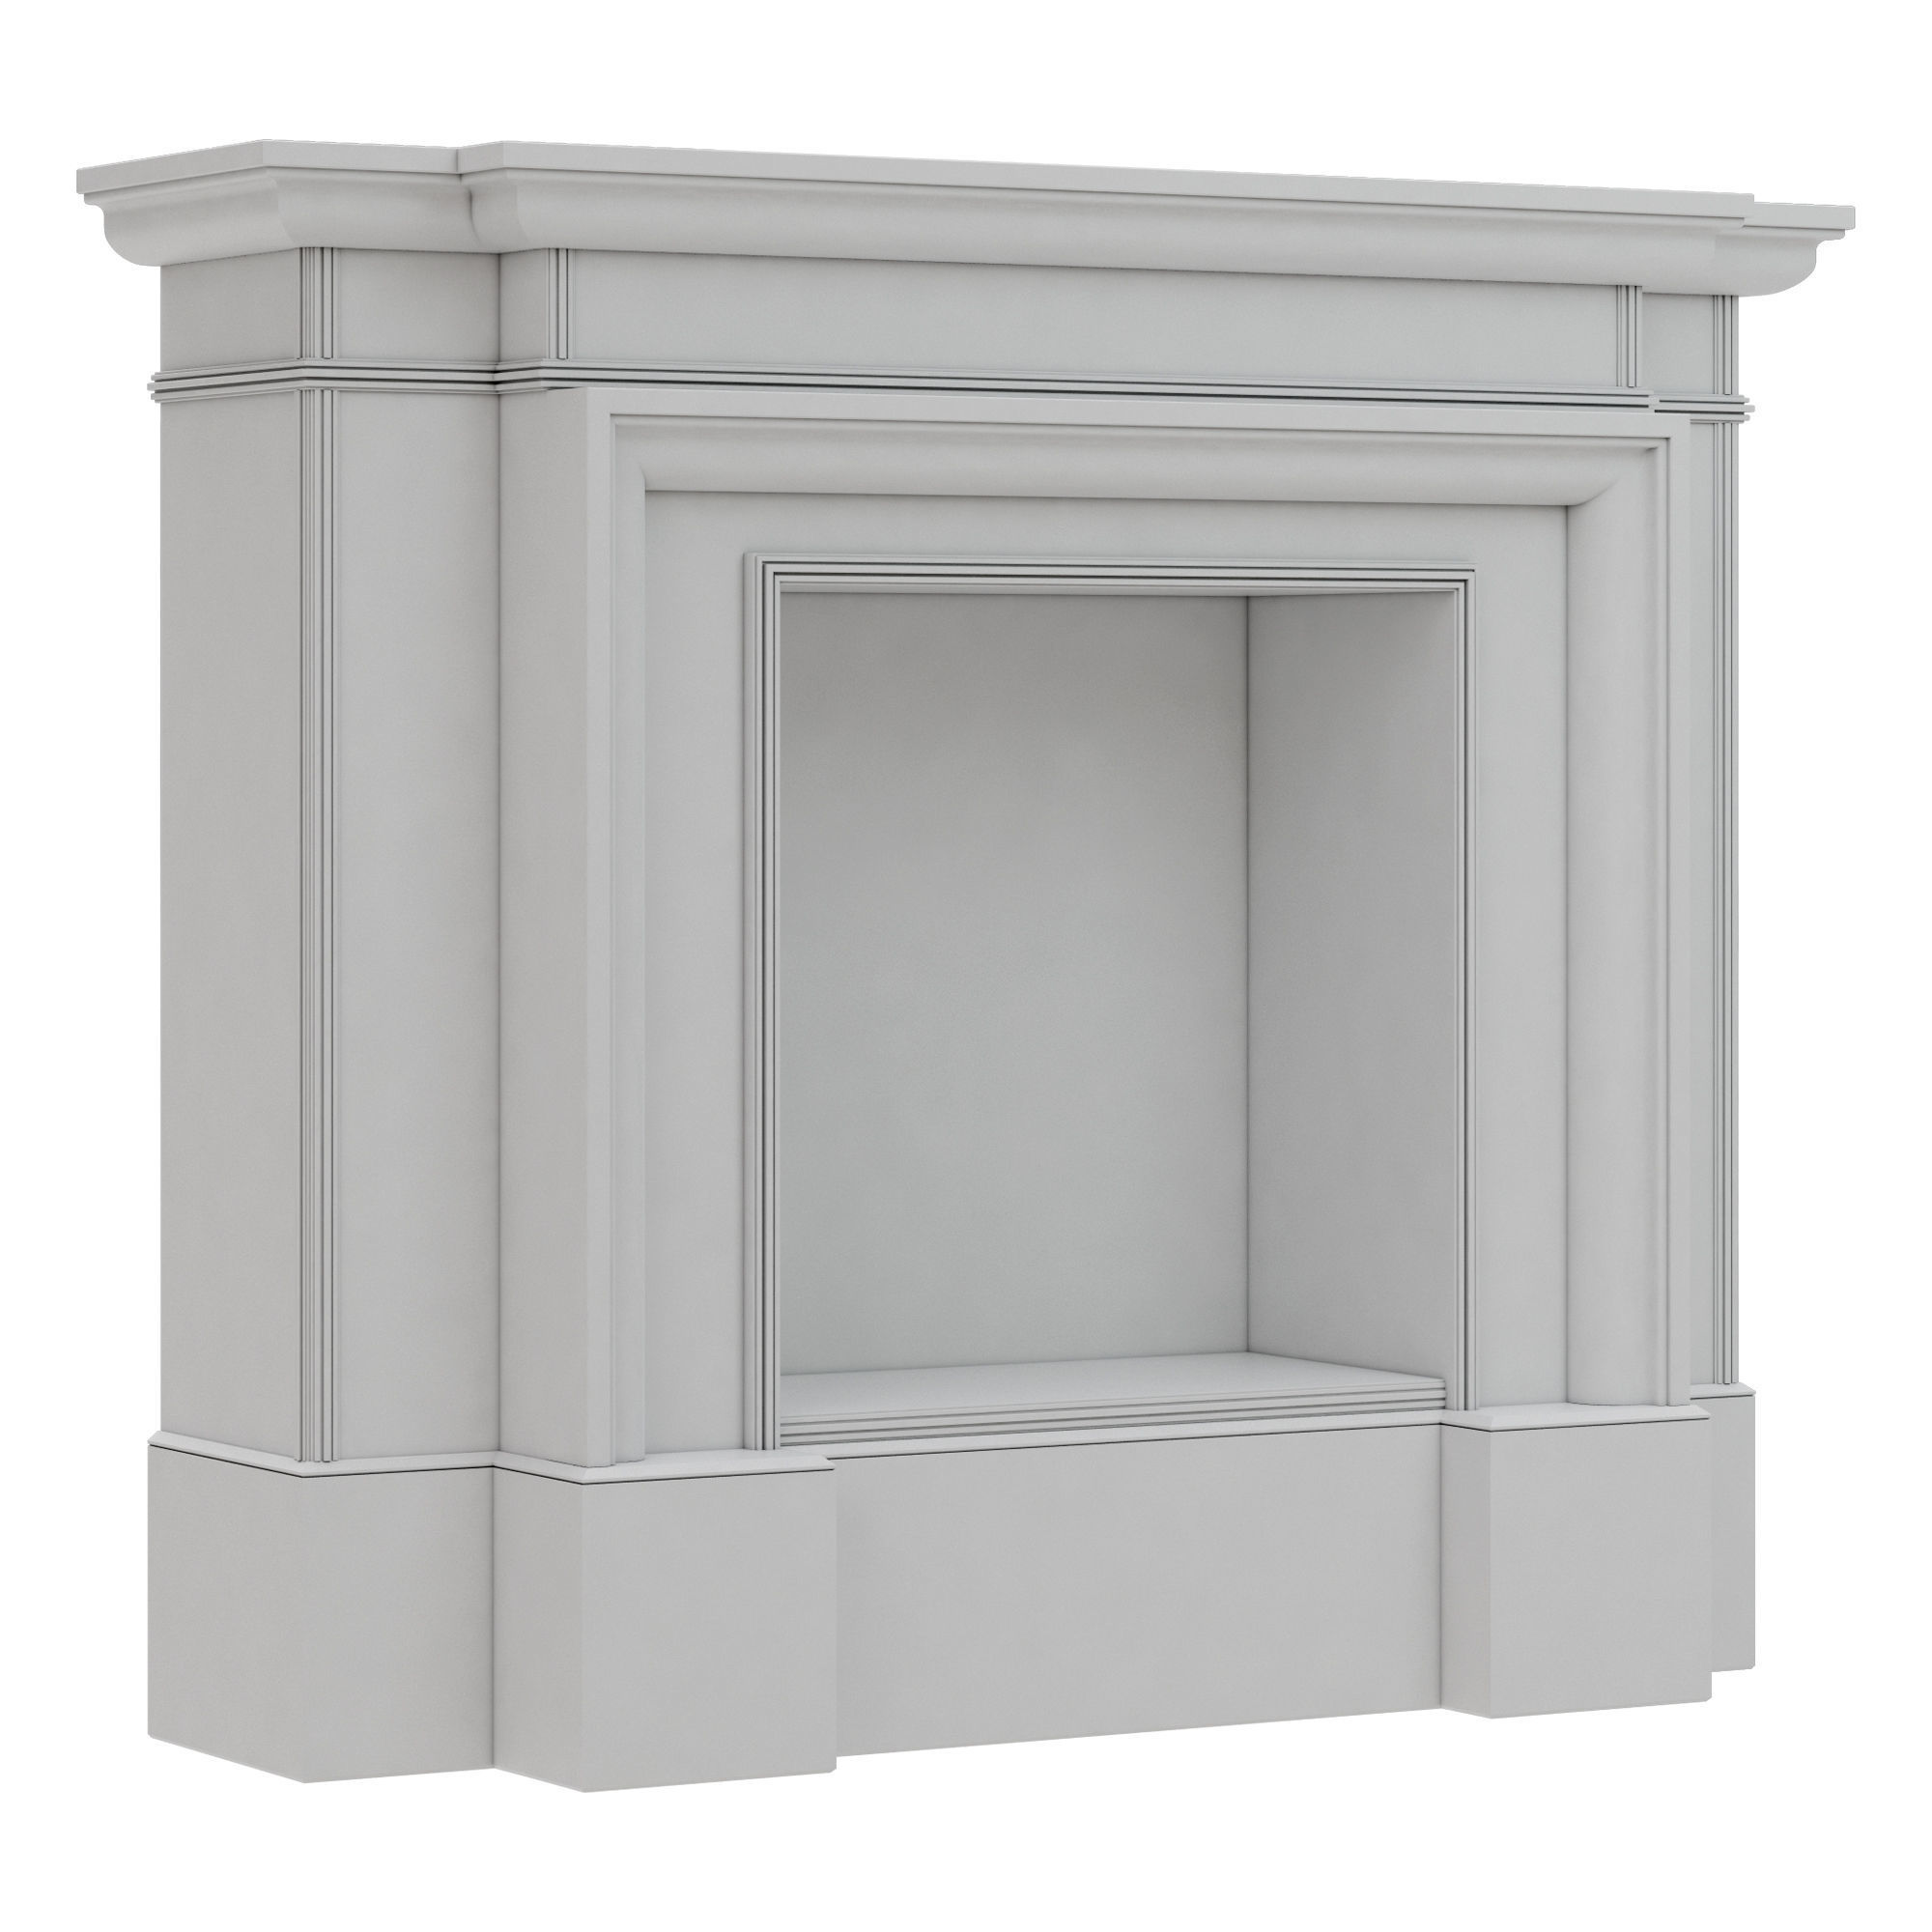 Dantone Home fireplace